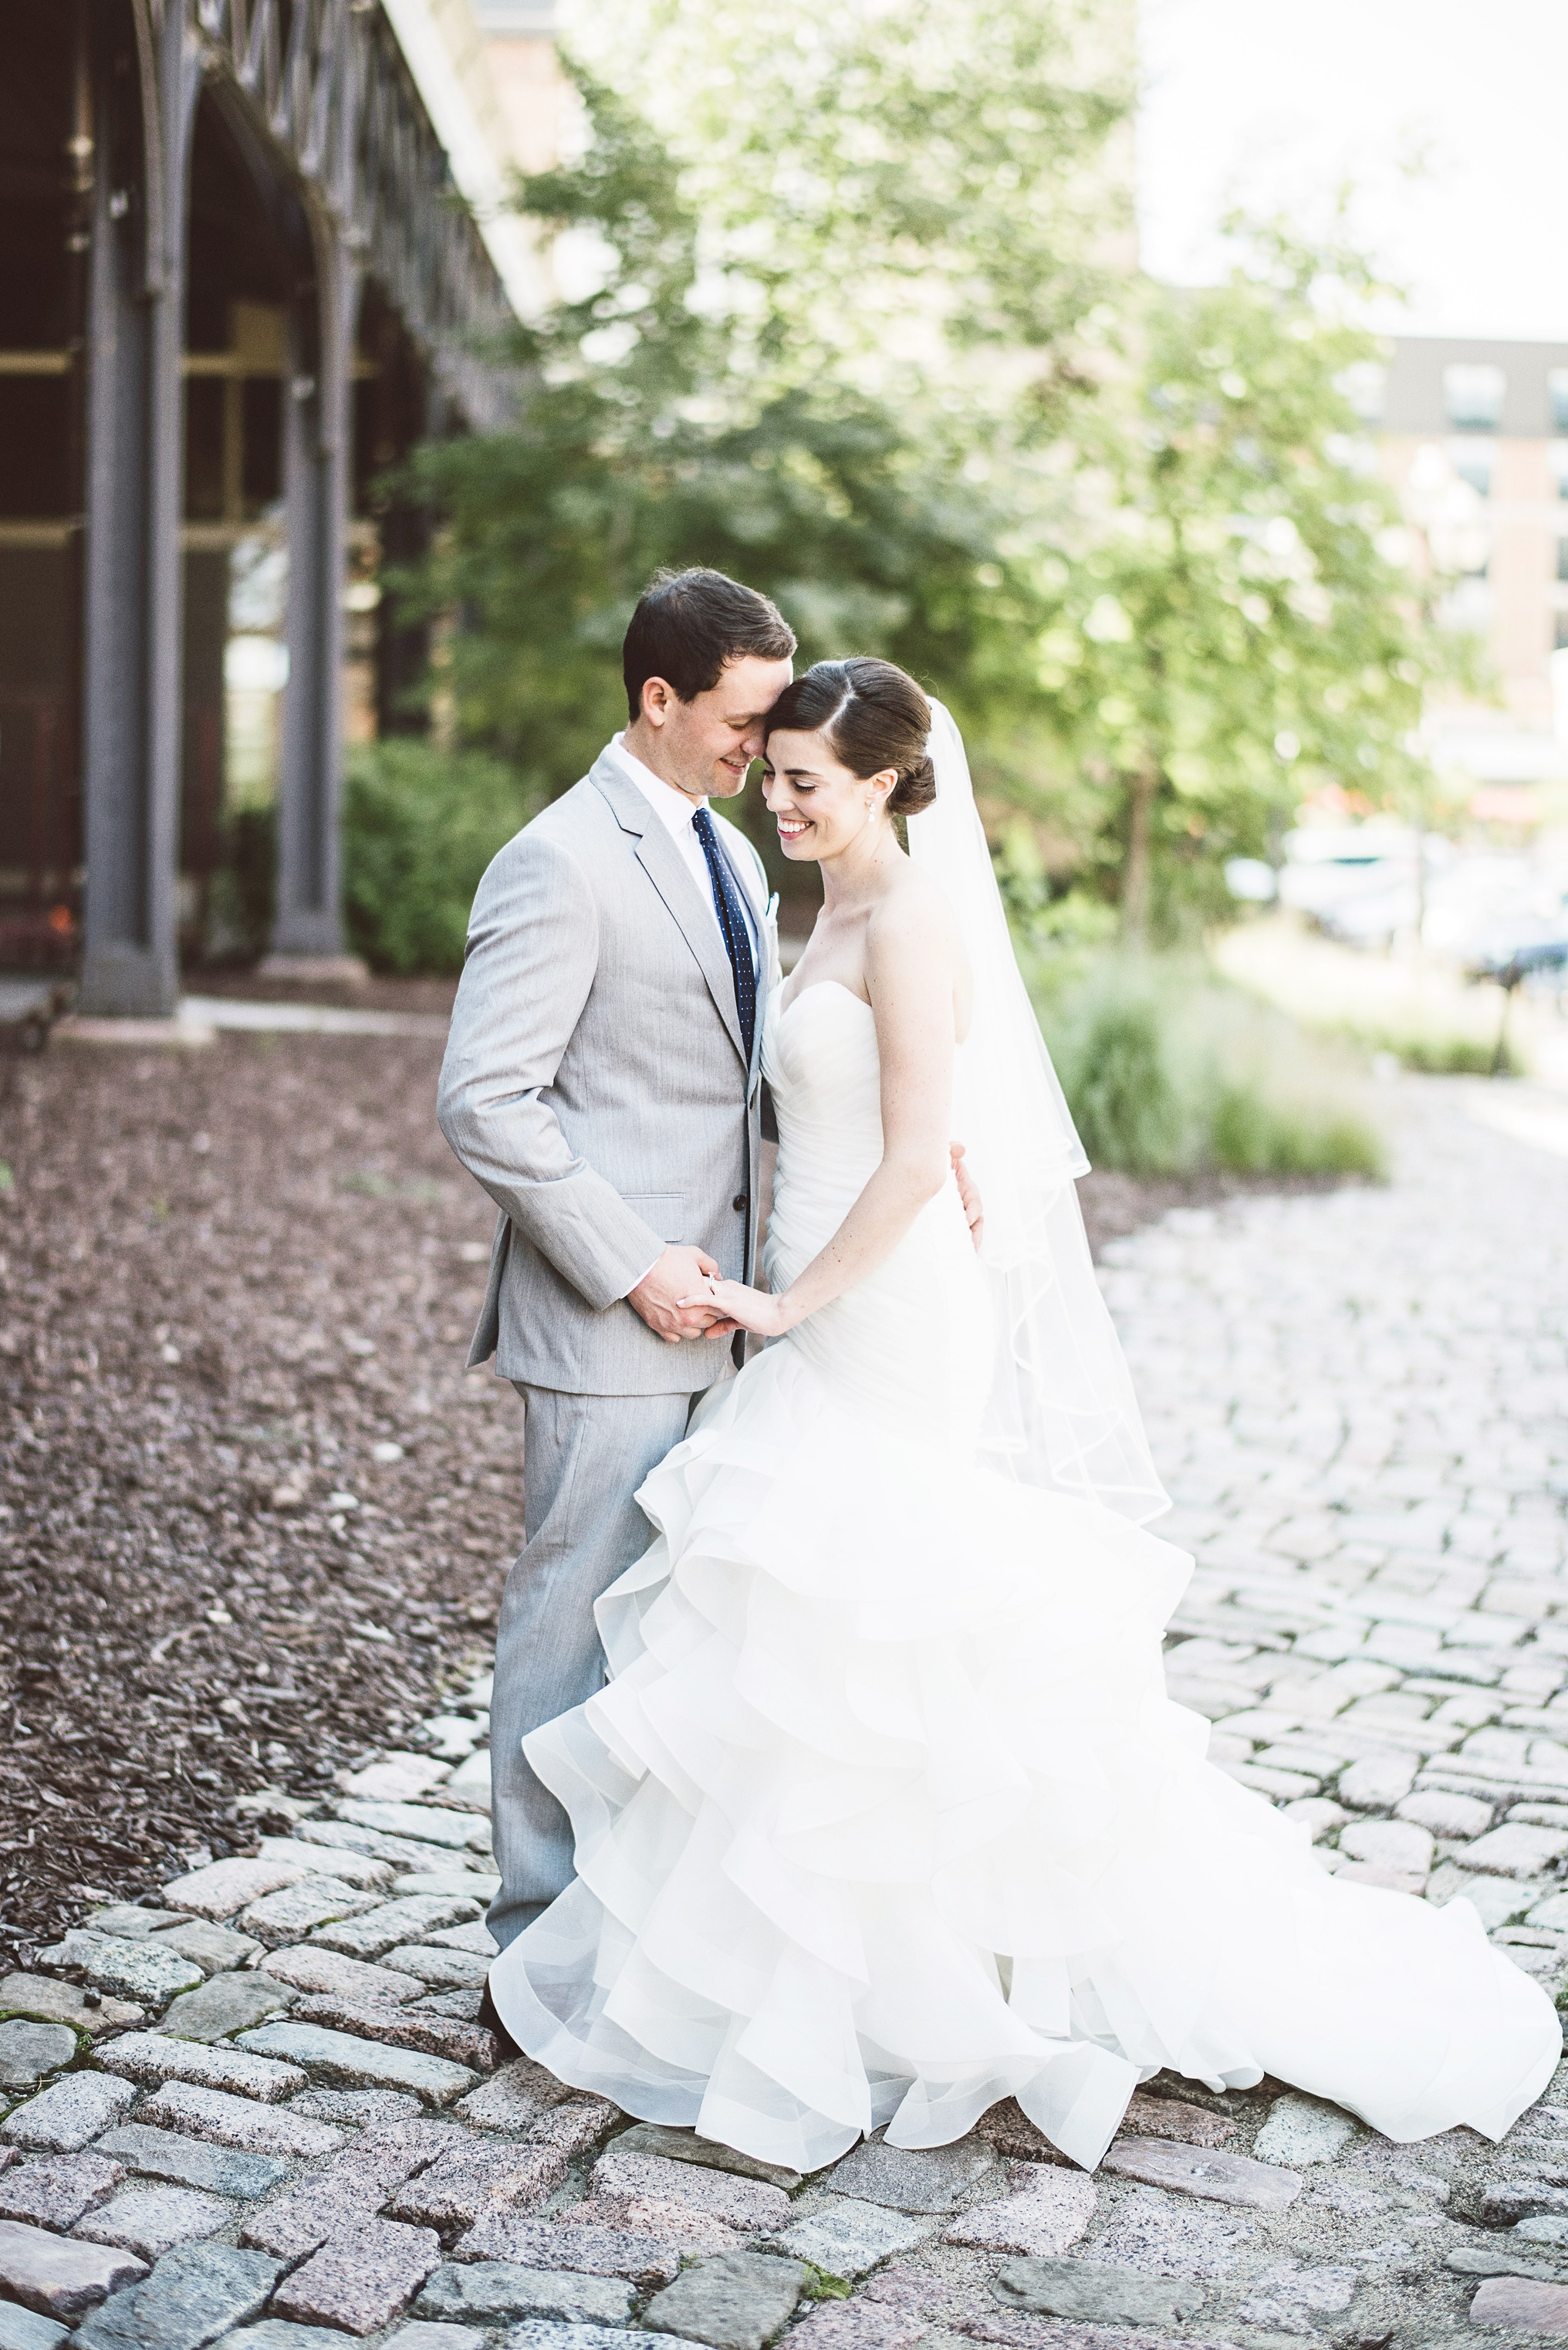 best_wedding_photography_2017_by_lucas_botz_photography_172.jpg